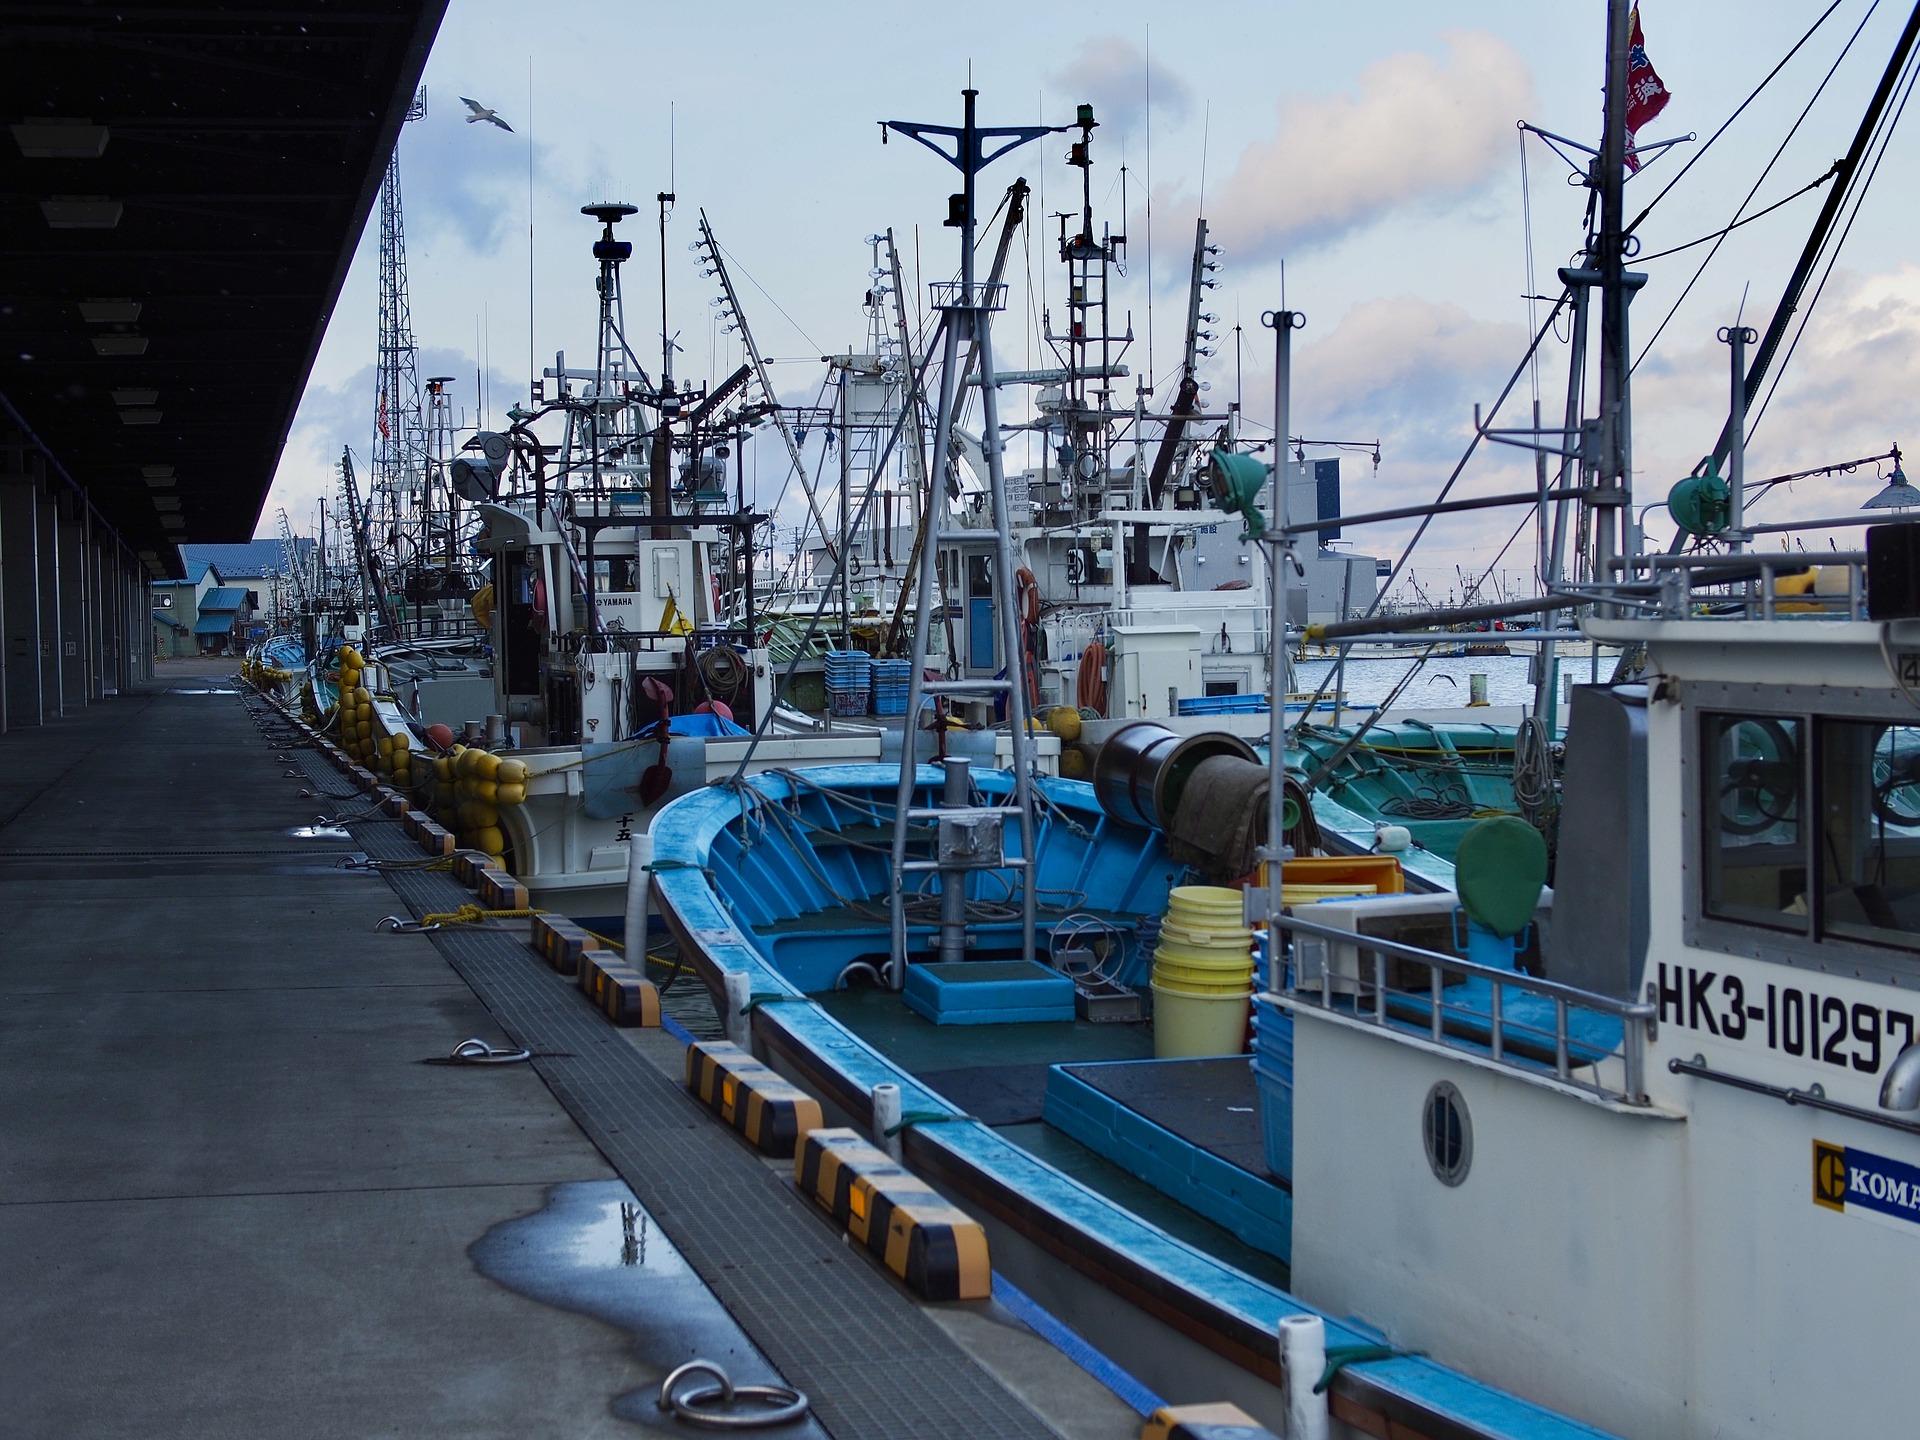 FISHING PORT, HOKKAIDO, NORTH JAPAN